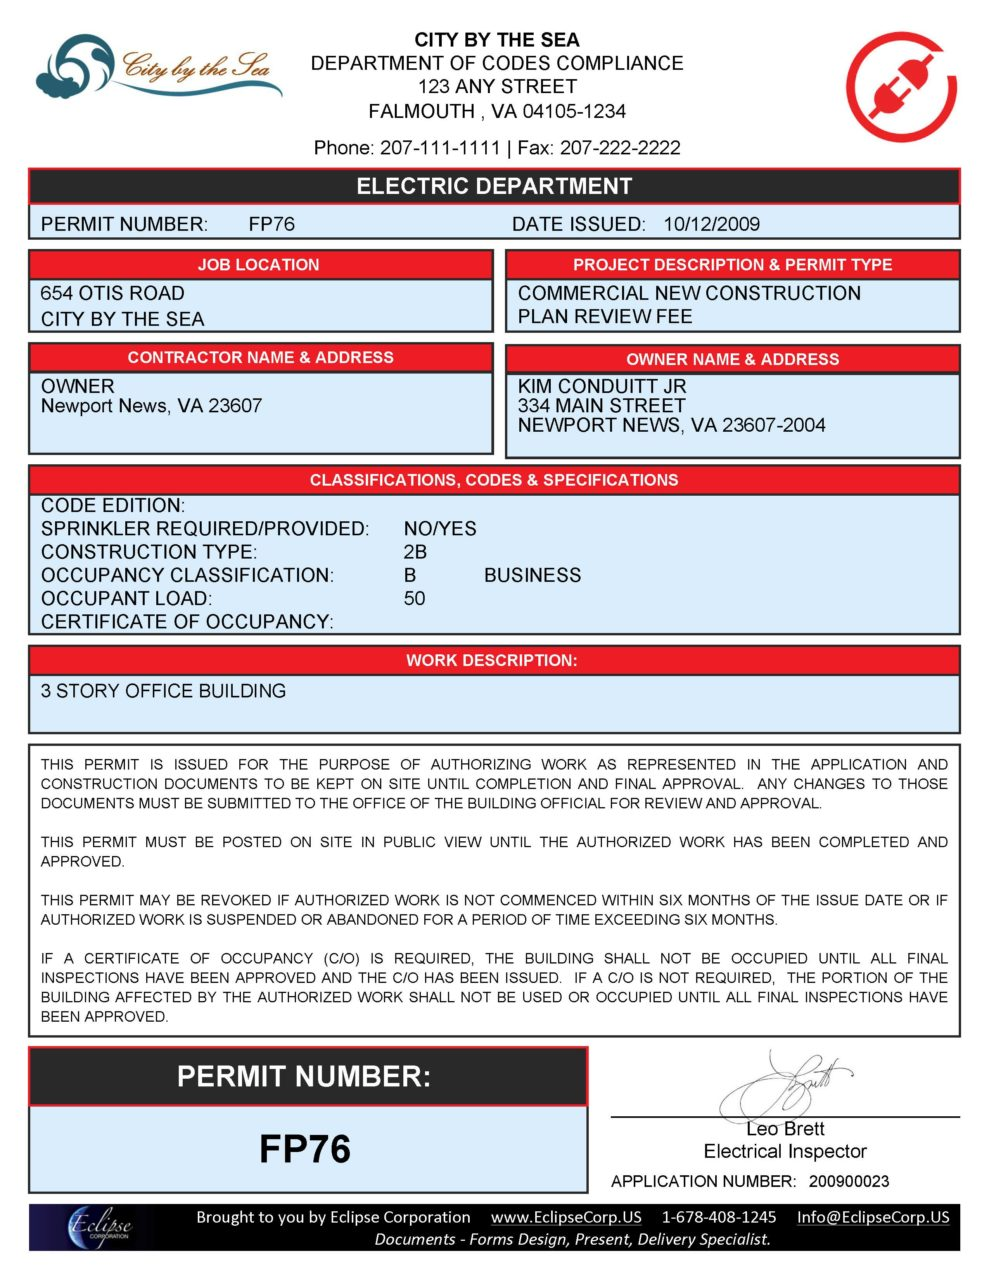 Sample Municipal Electric Permit